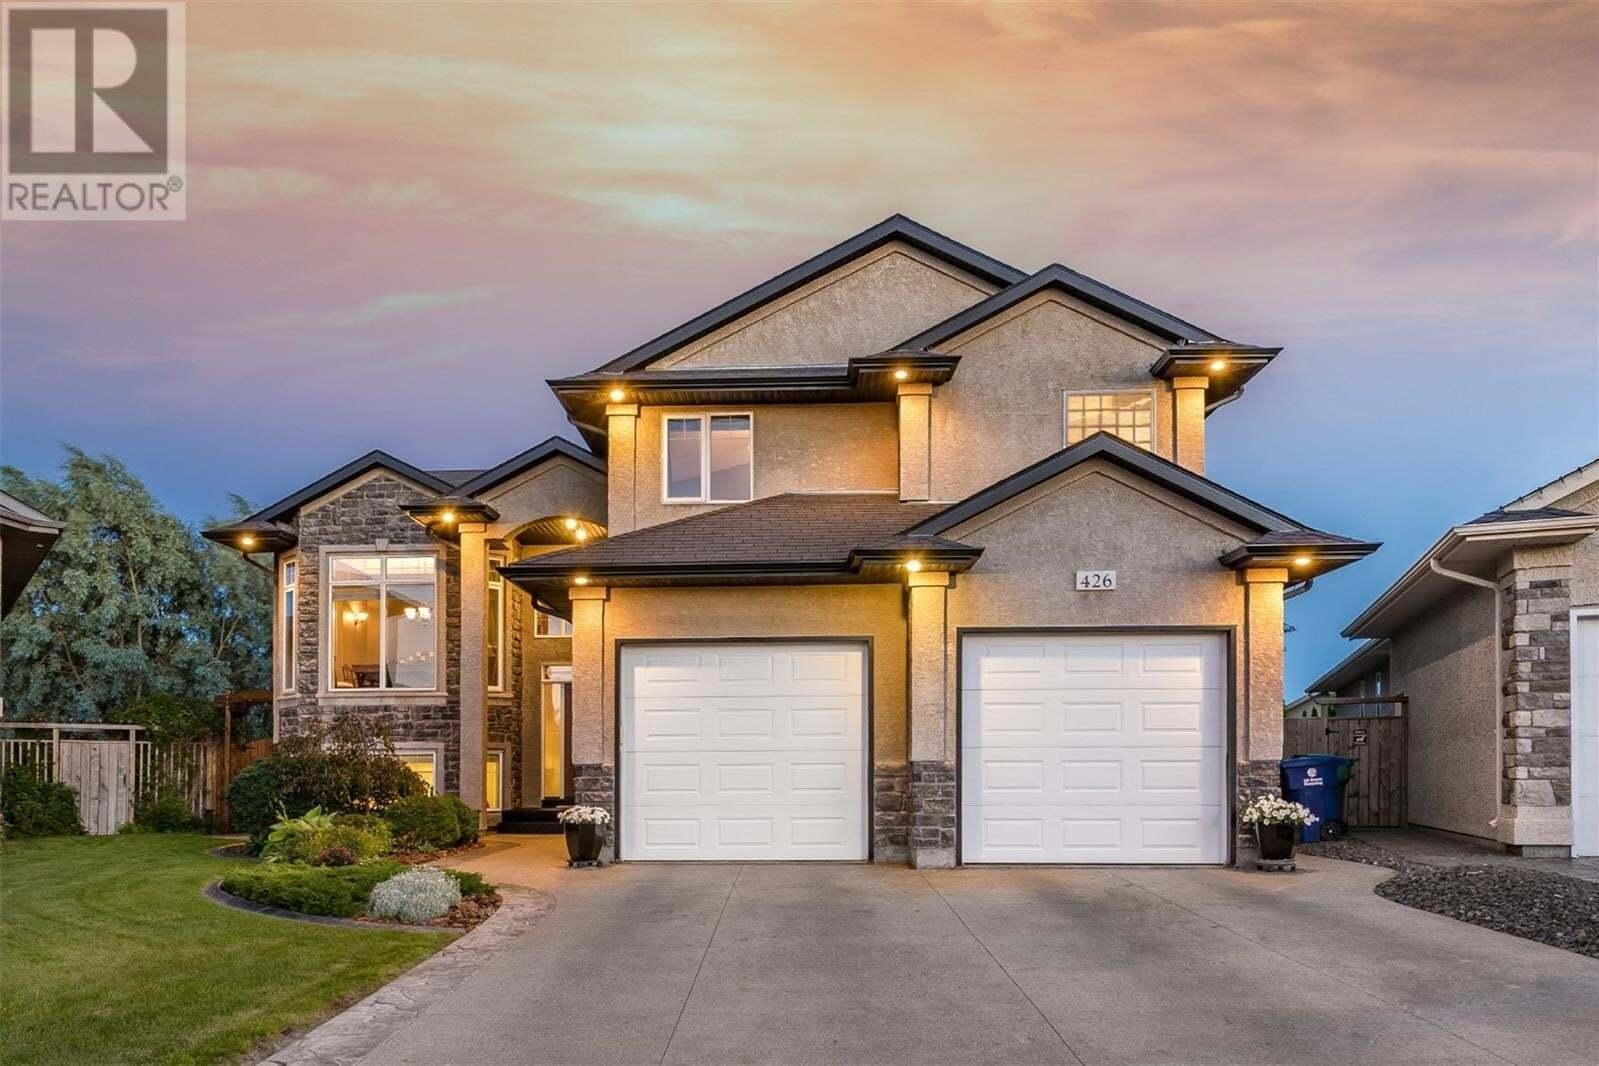 House for sale at 426 Bolton Pl Saskatoon Saskatchewan - MLS: SK815282